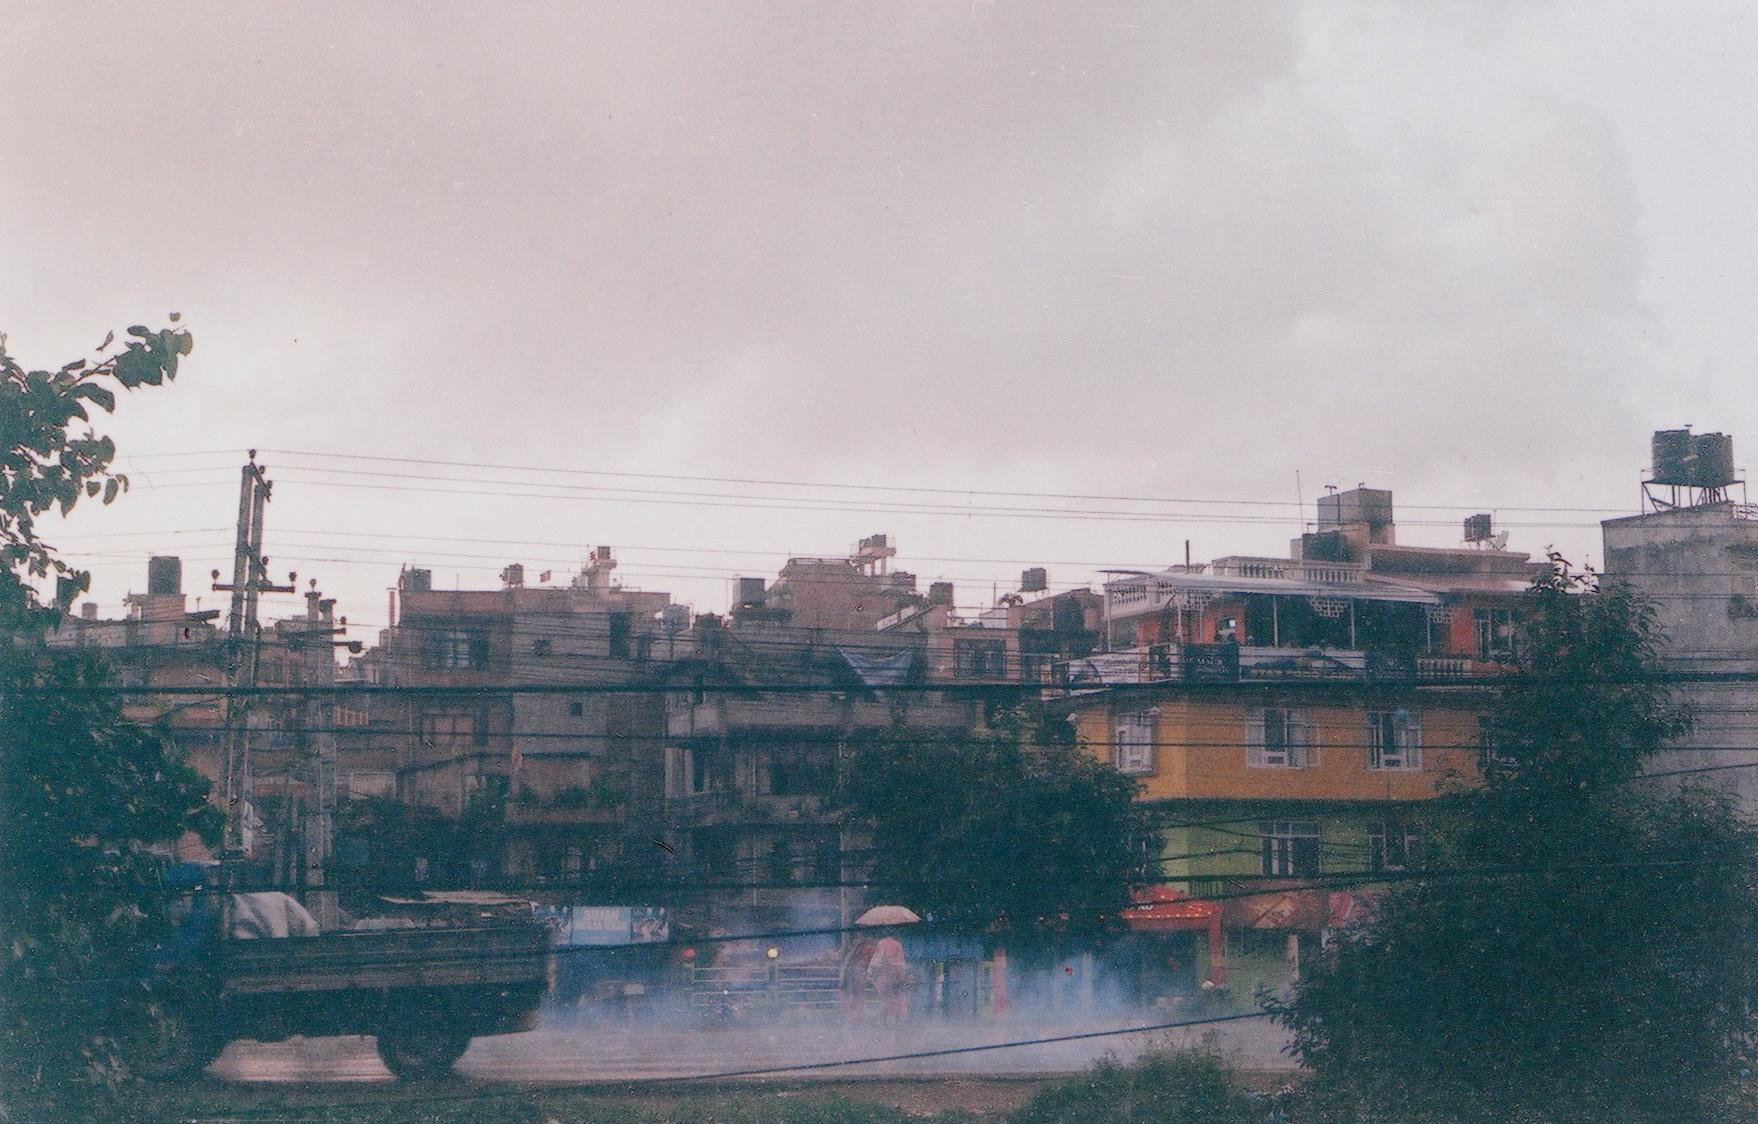 Kathmandu, Sep 2012